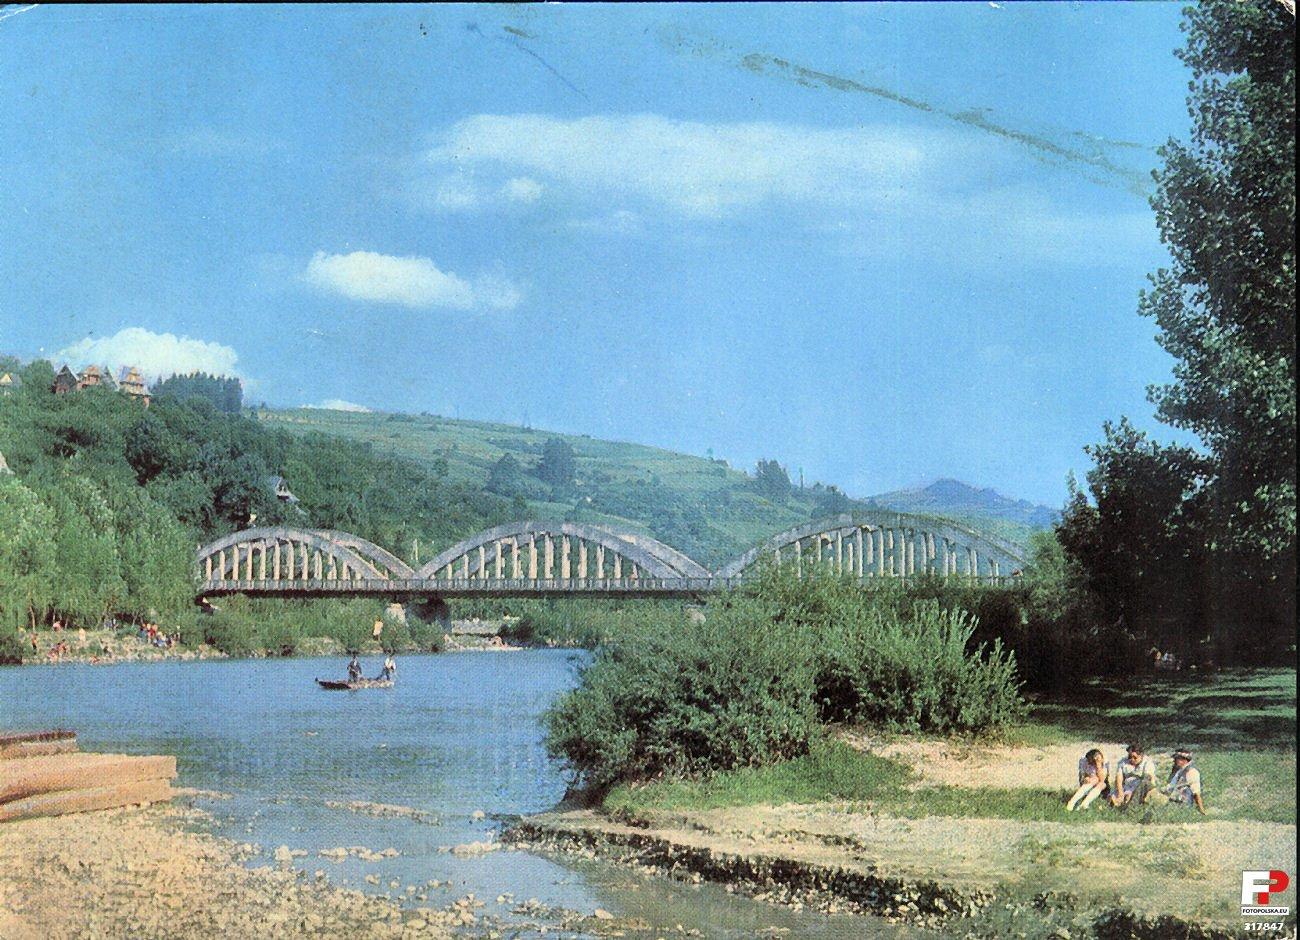 http://fotopolska.eu/foto/317/317847.jpg